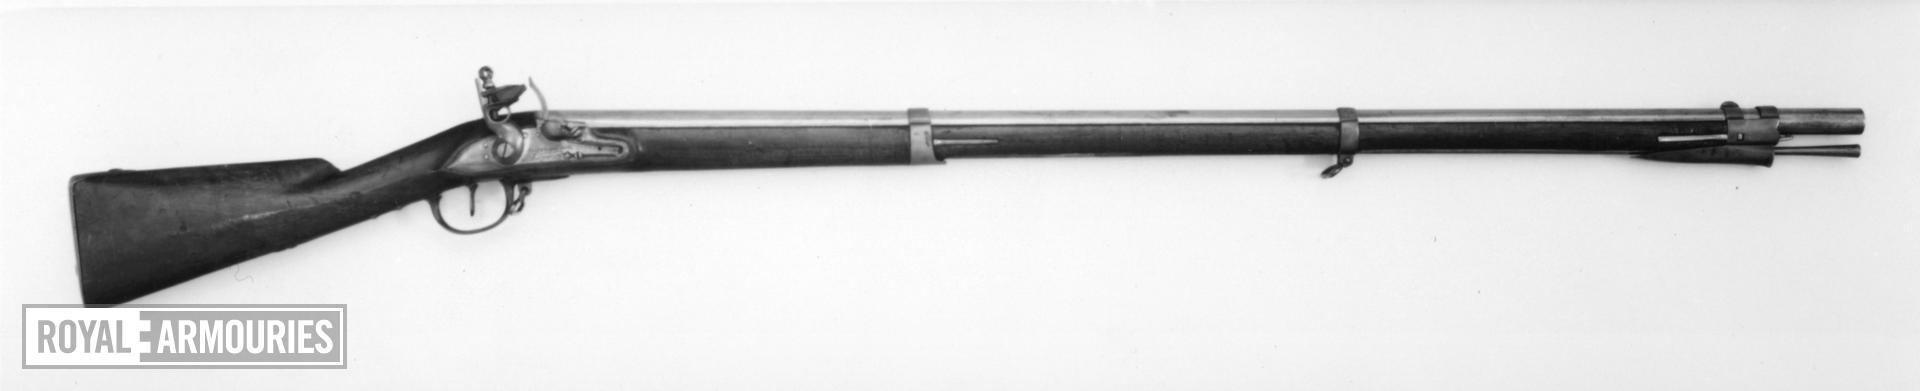 Flintlock muzzle-loading military musket - By Frey Light infantry model